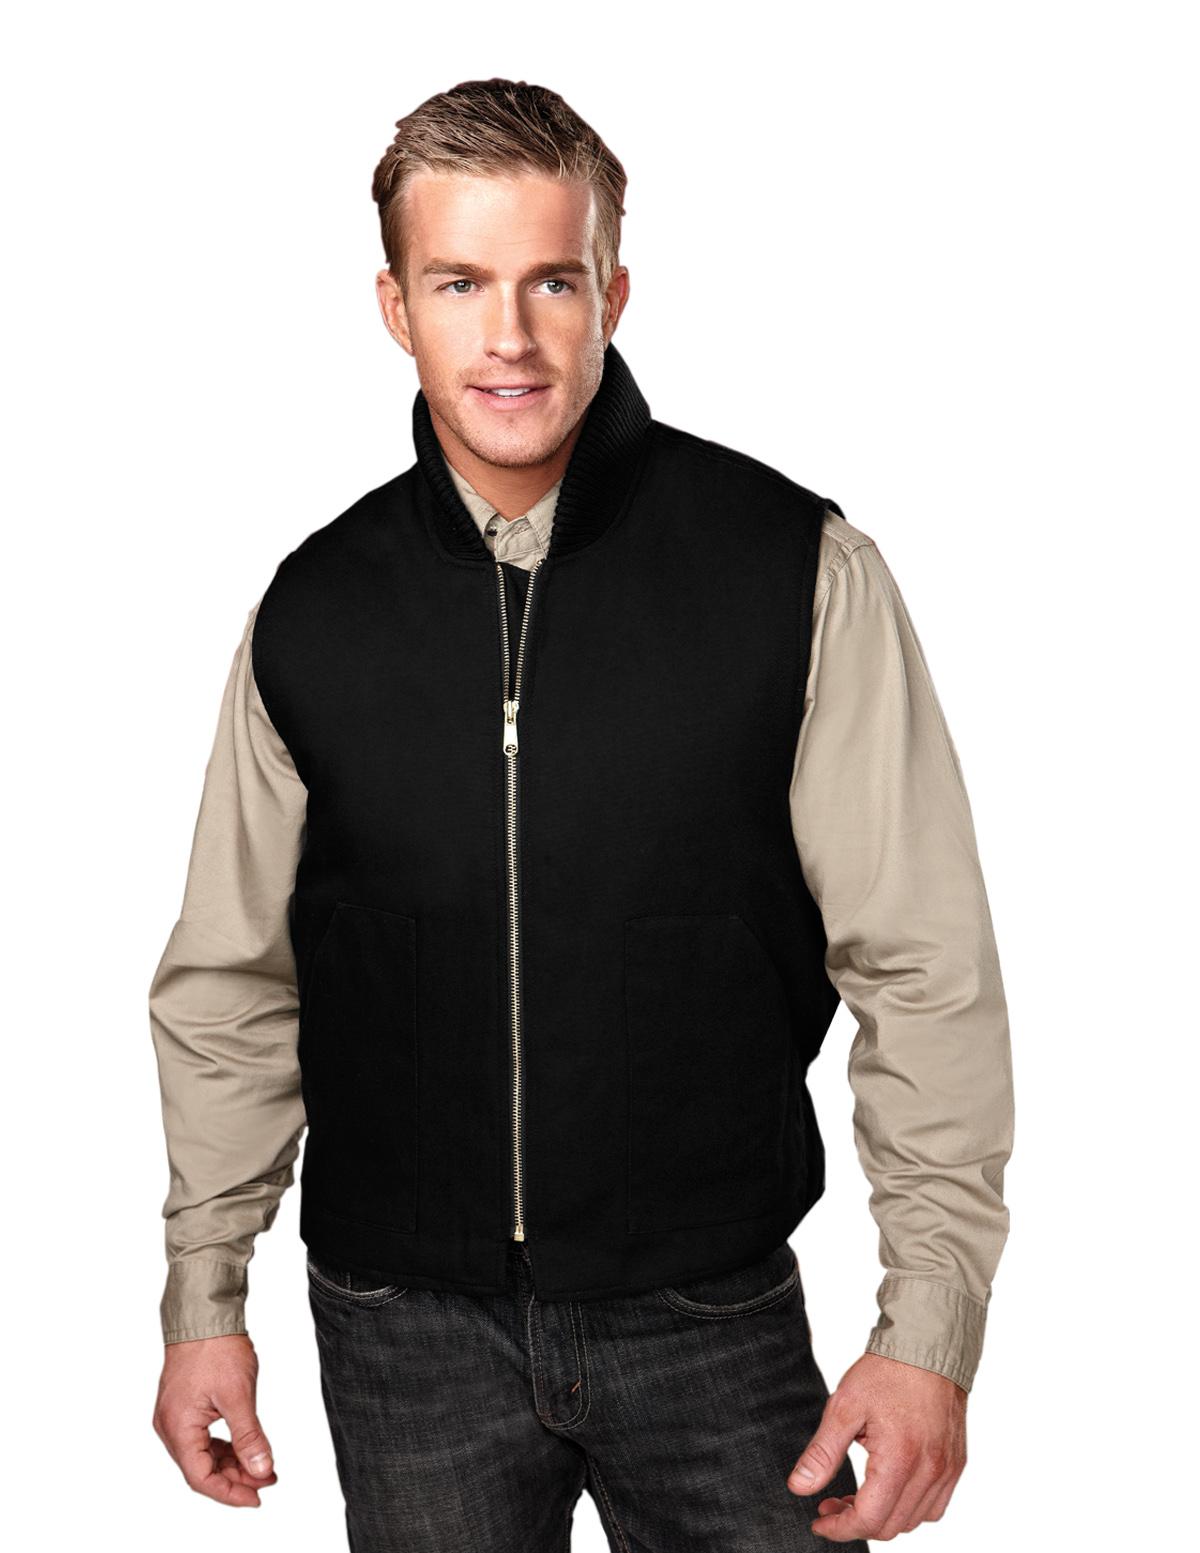 Tri-Mountain Lodestar 4400 Cotton Canvas Vest, 2X-Large, Black/Black/Black